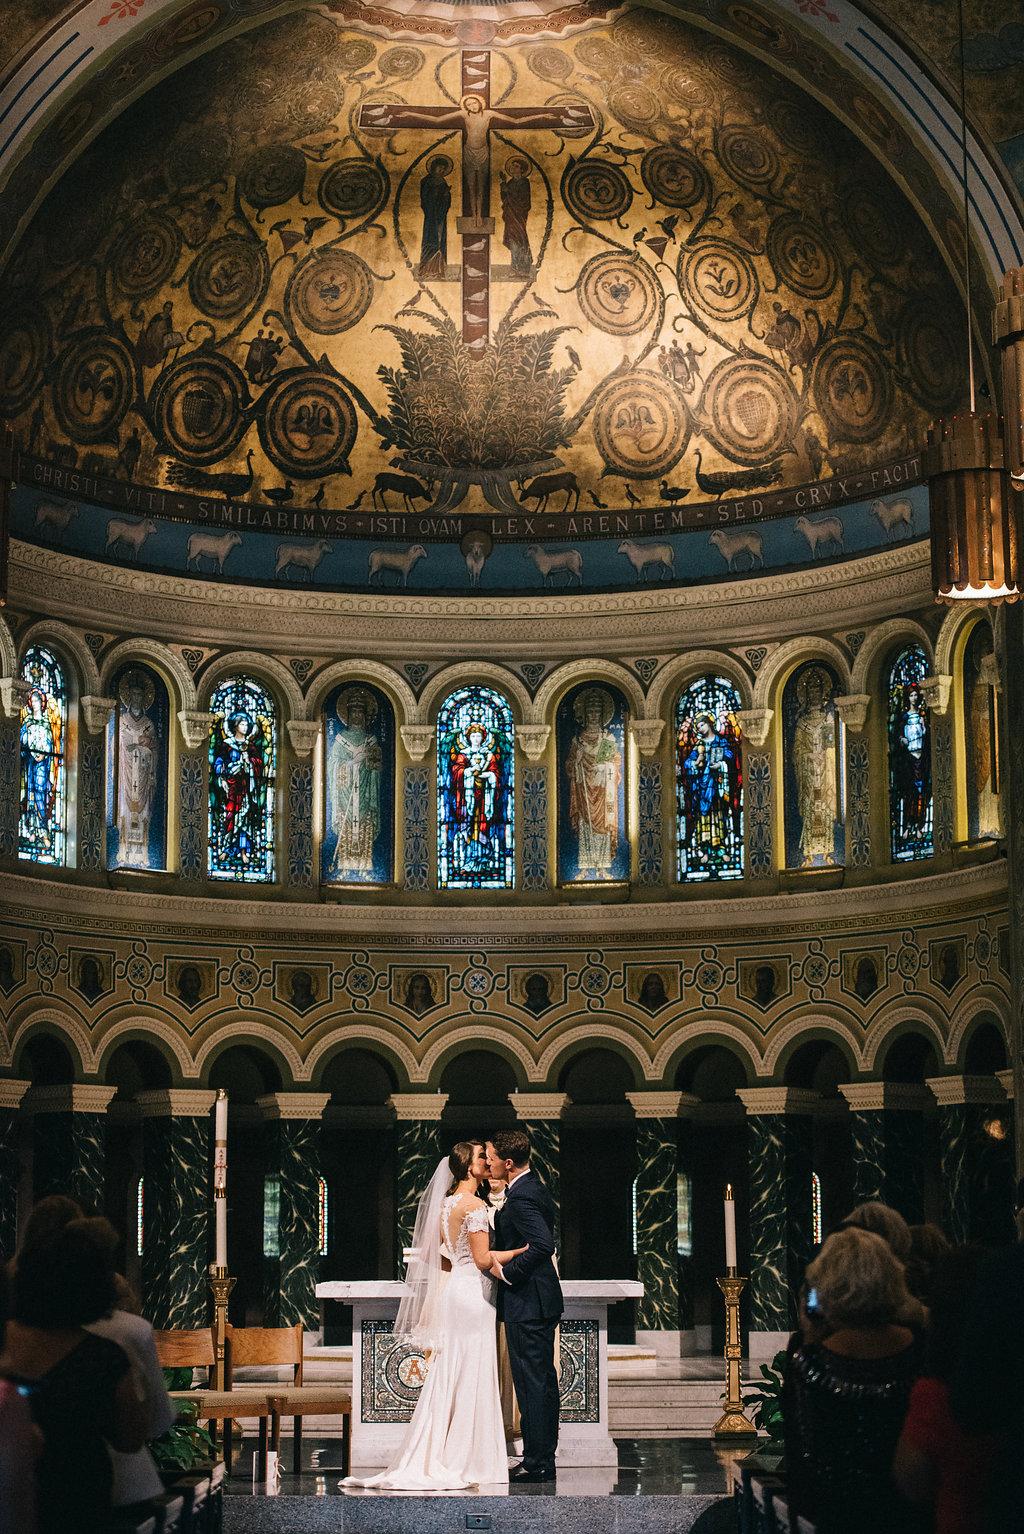 0202--Katelyn_+_Brendan-Wedding_Highlights-Shot_by_Couple_of_Dudes-Joe_Tighe.jpg